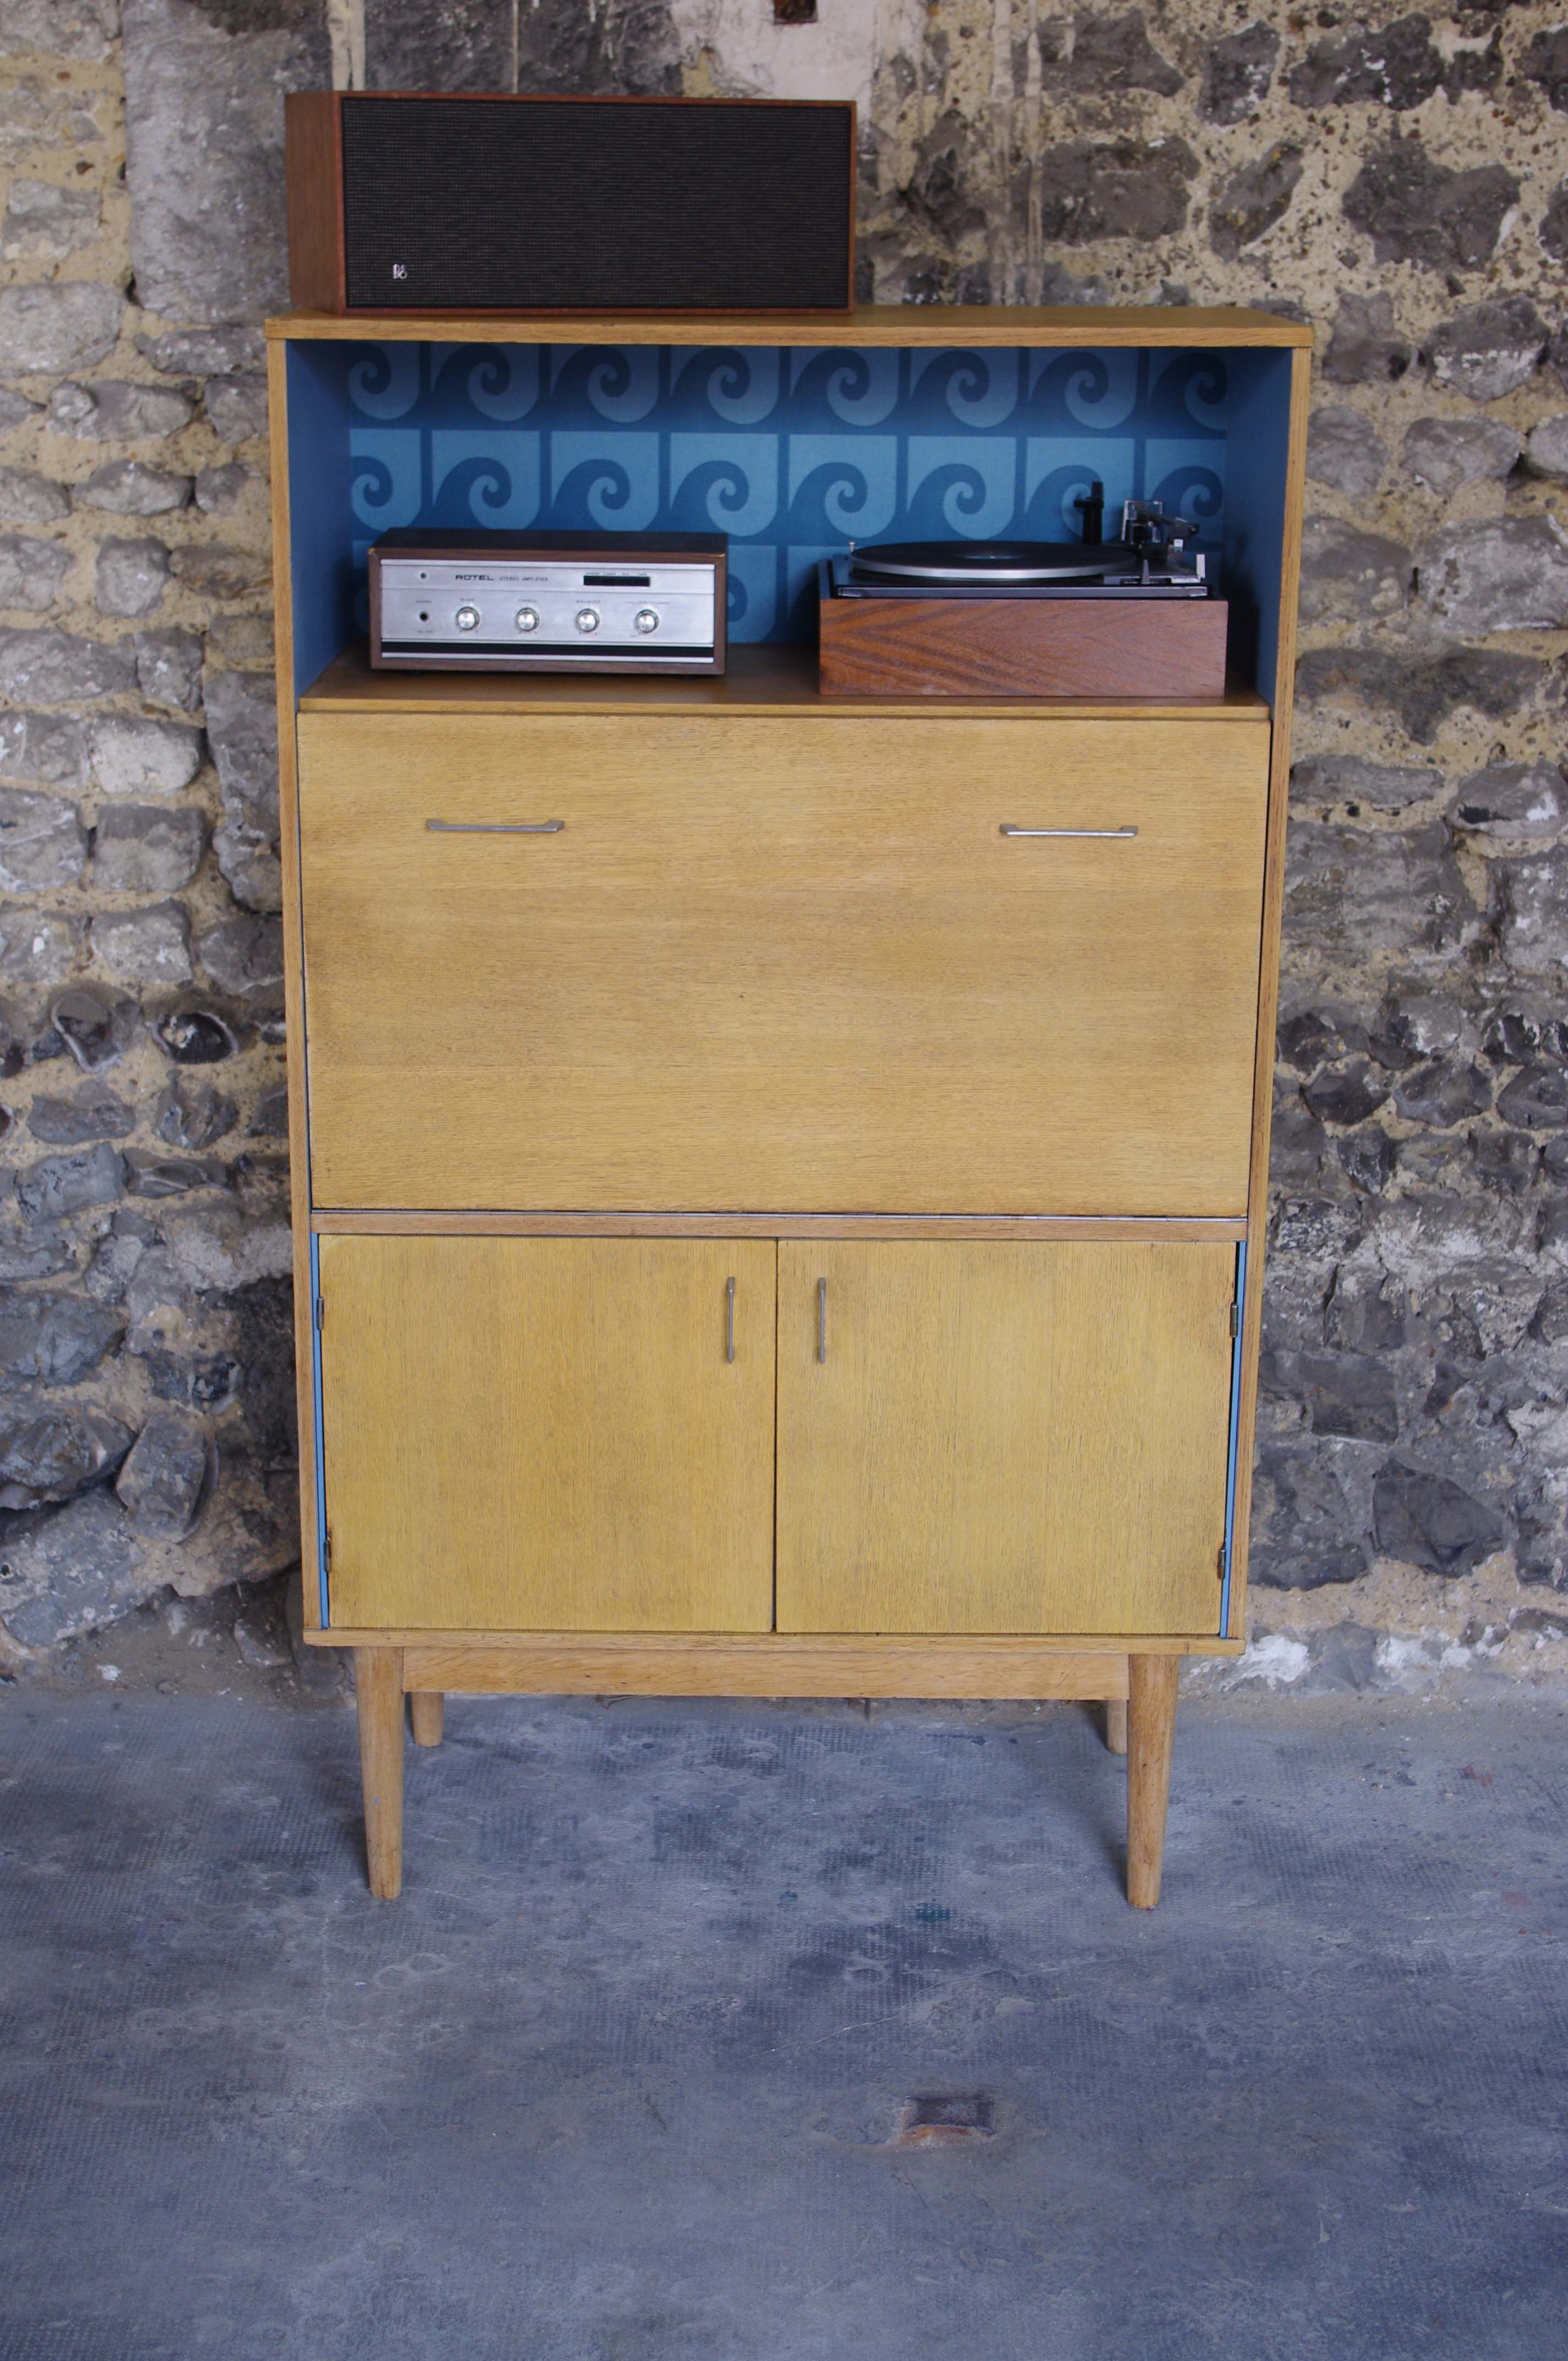 secr taire biblioth que vintage pierre cardin wave 3 rayr concept mobilier vintage. Black Bedroom Furniture Sets. Home Design Ideas